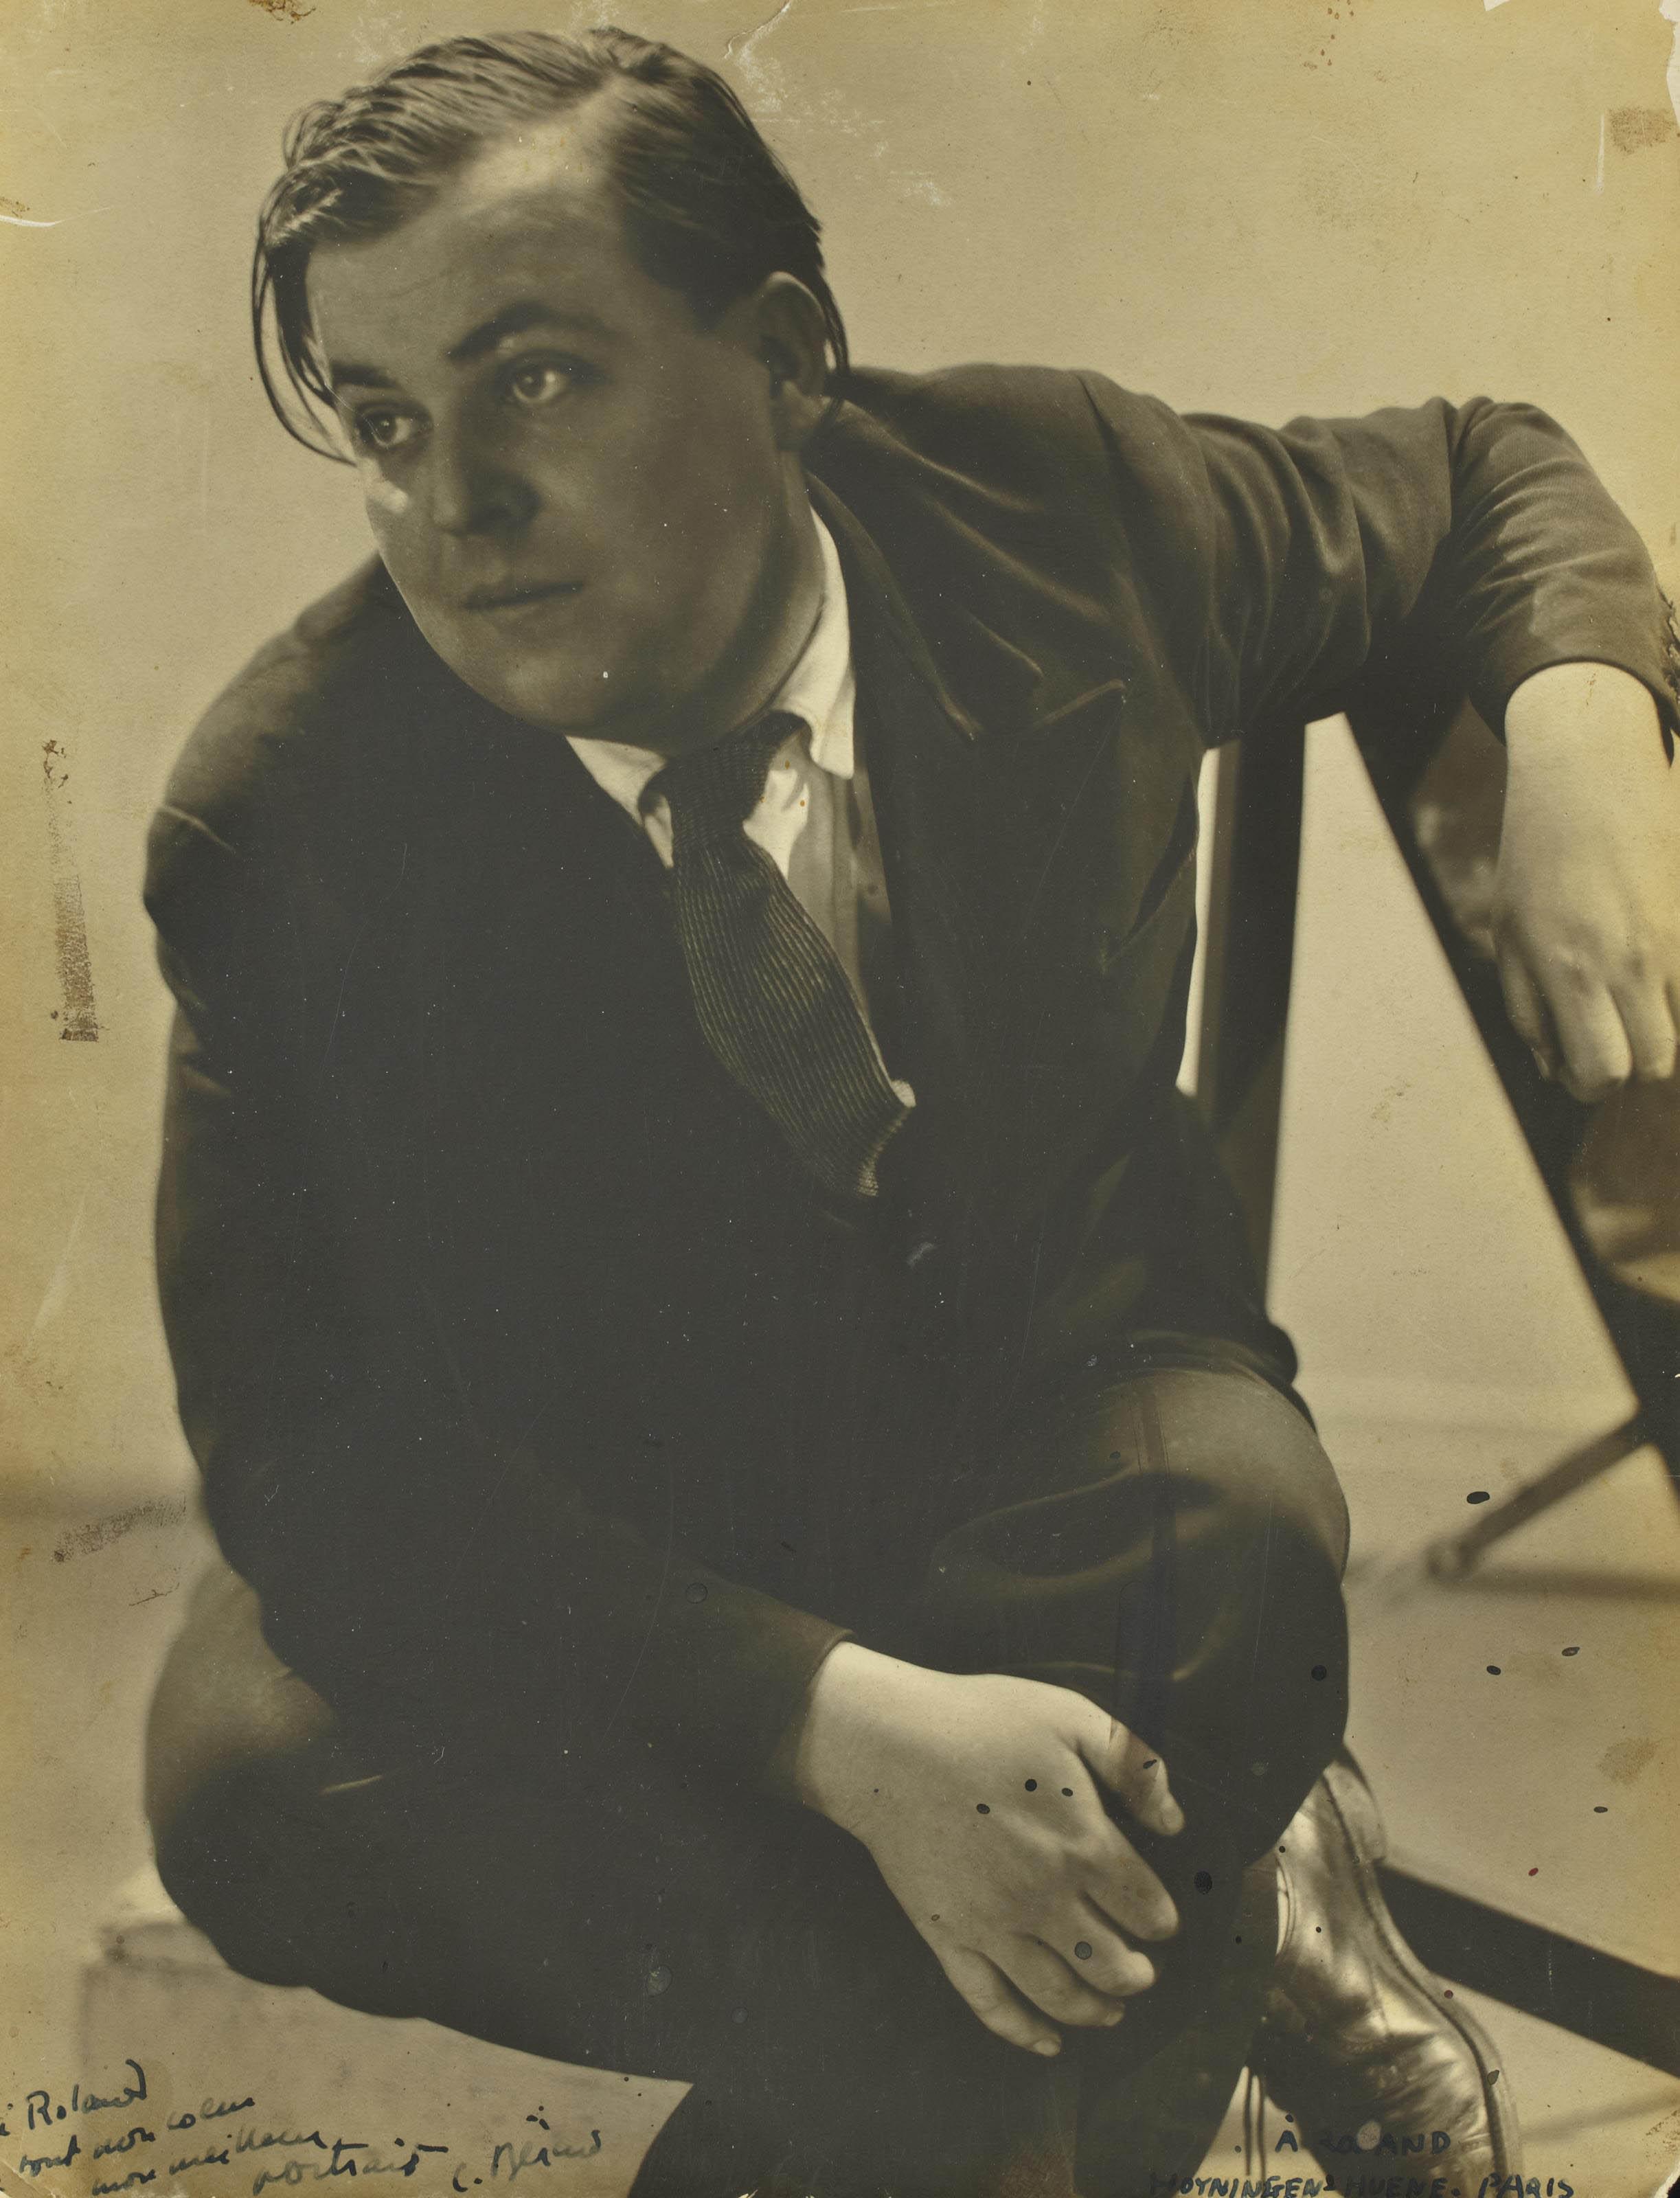 Portrait de Christian Berard, vers 1930